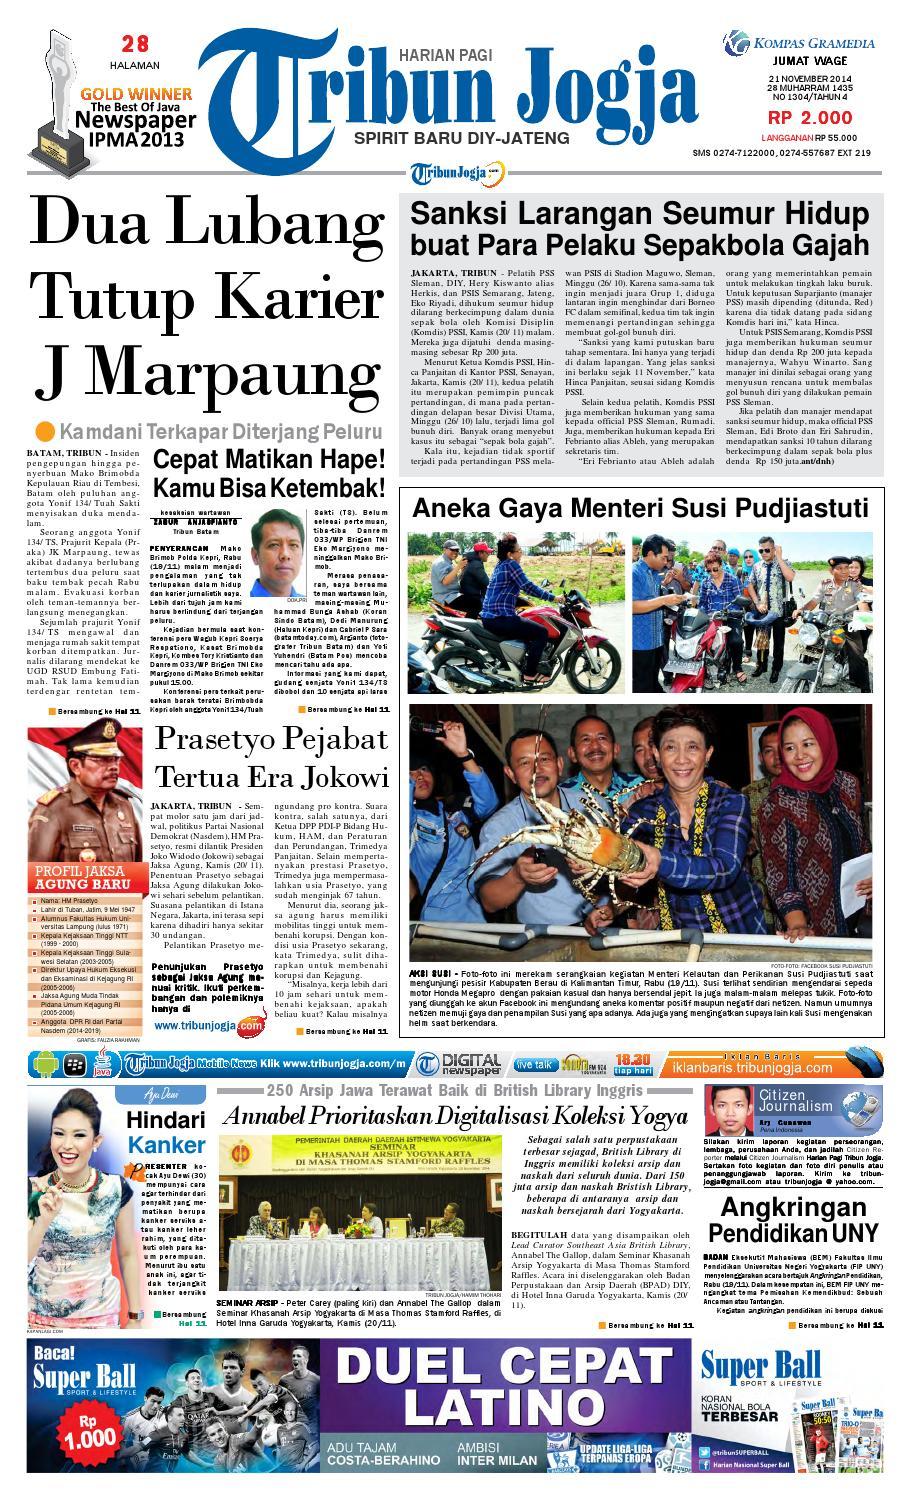 Tribunjogja 21 11 2014 By Tribun Jogja Issuu Krezi Kamis 17 Bantal Leher Bulu C House